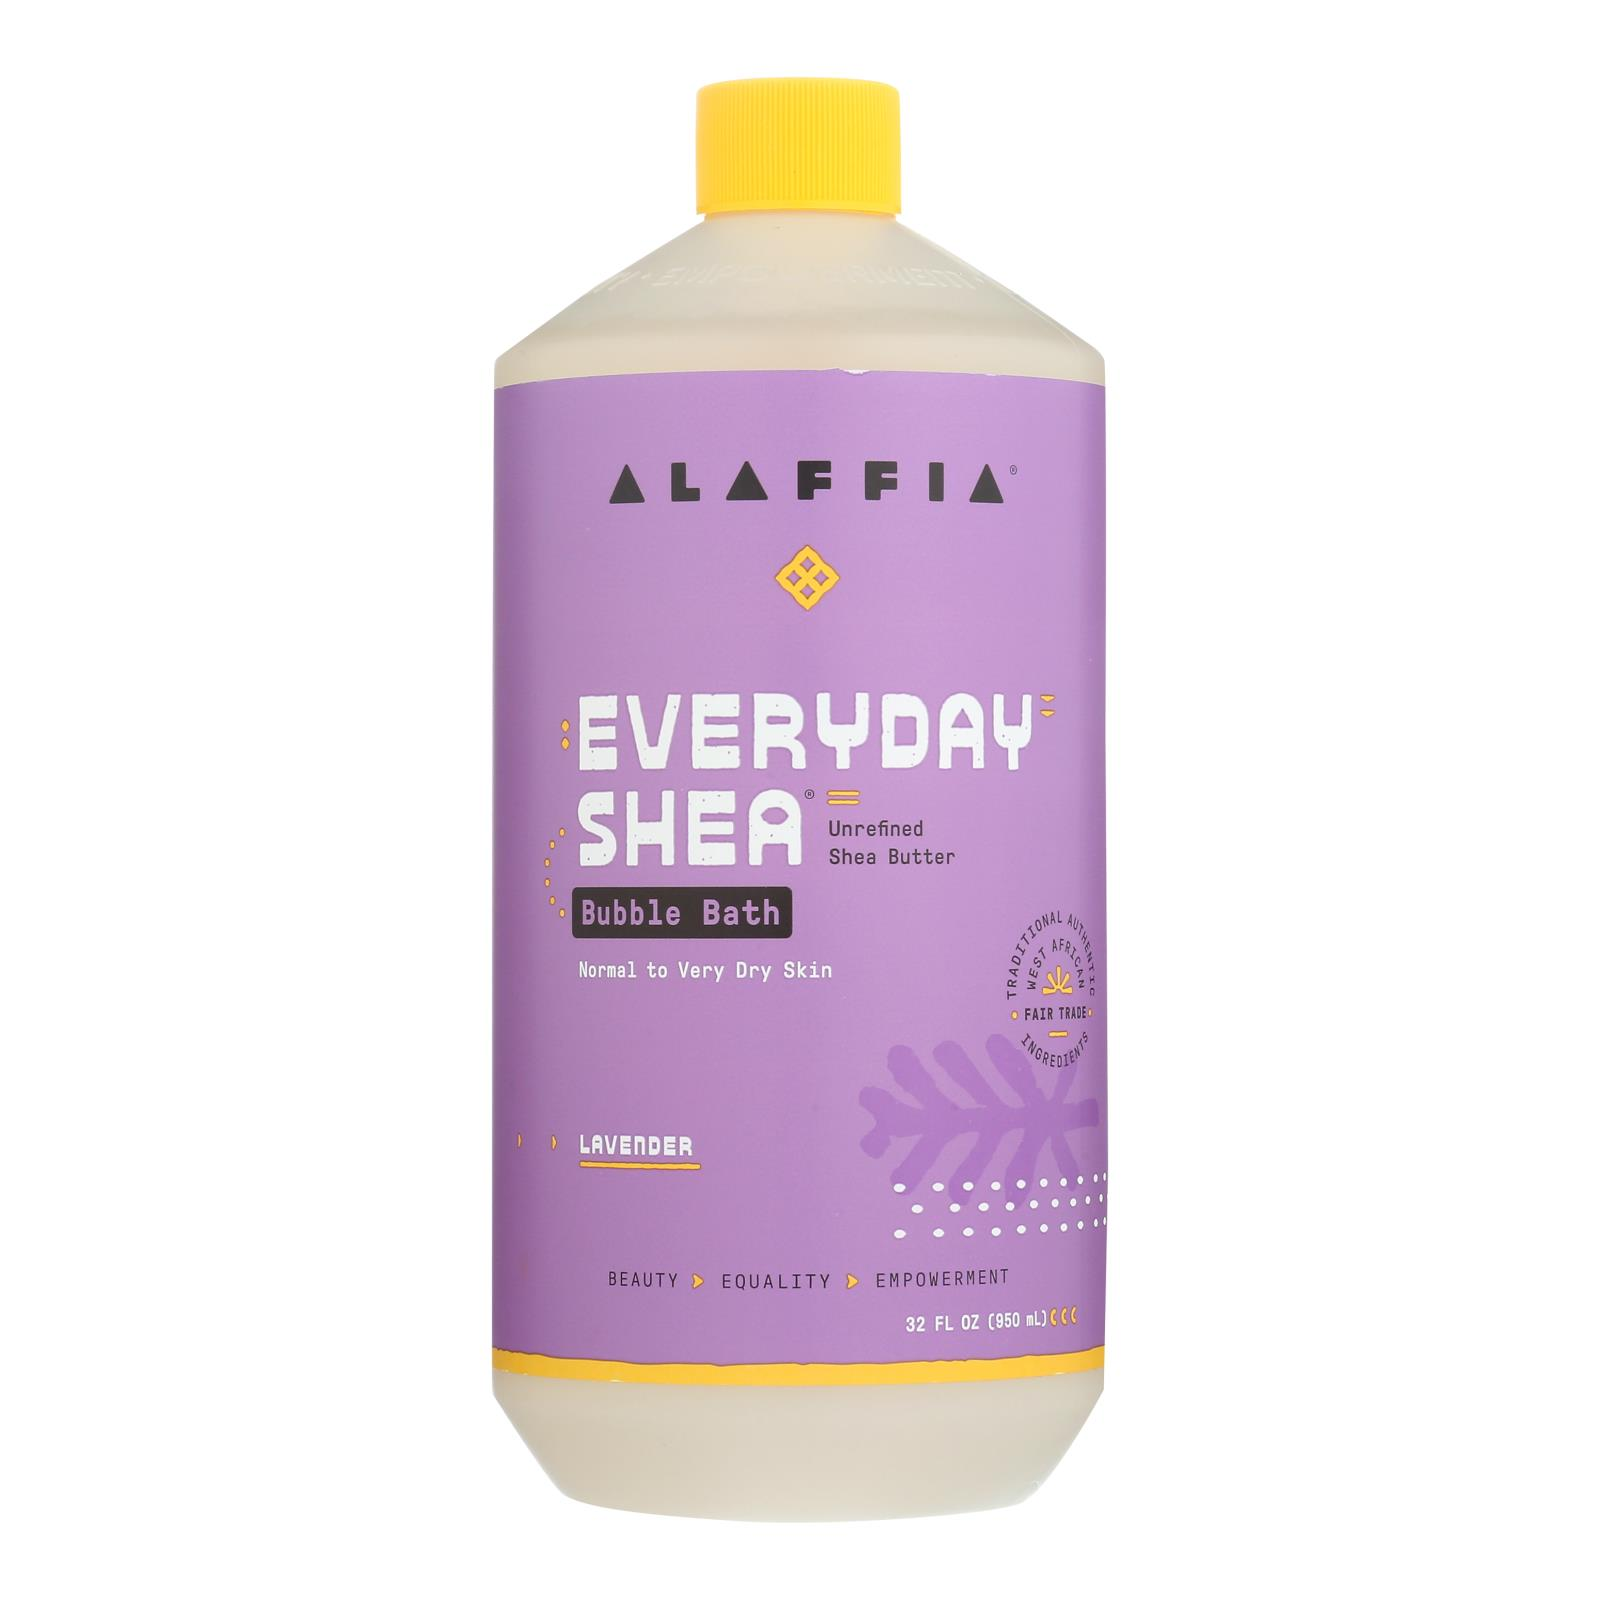 Alaffia - Everyday Bubble Bath - Lavender - 32 fl oz.